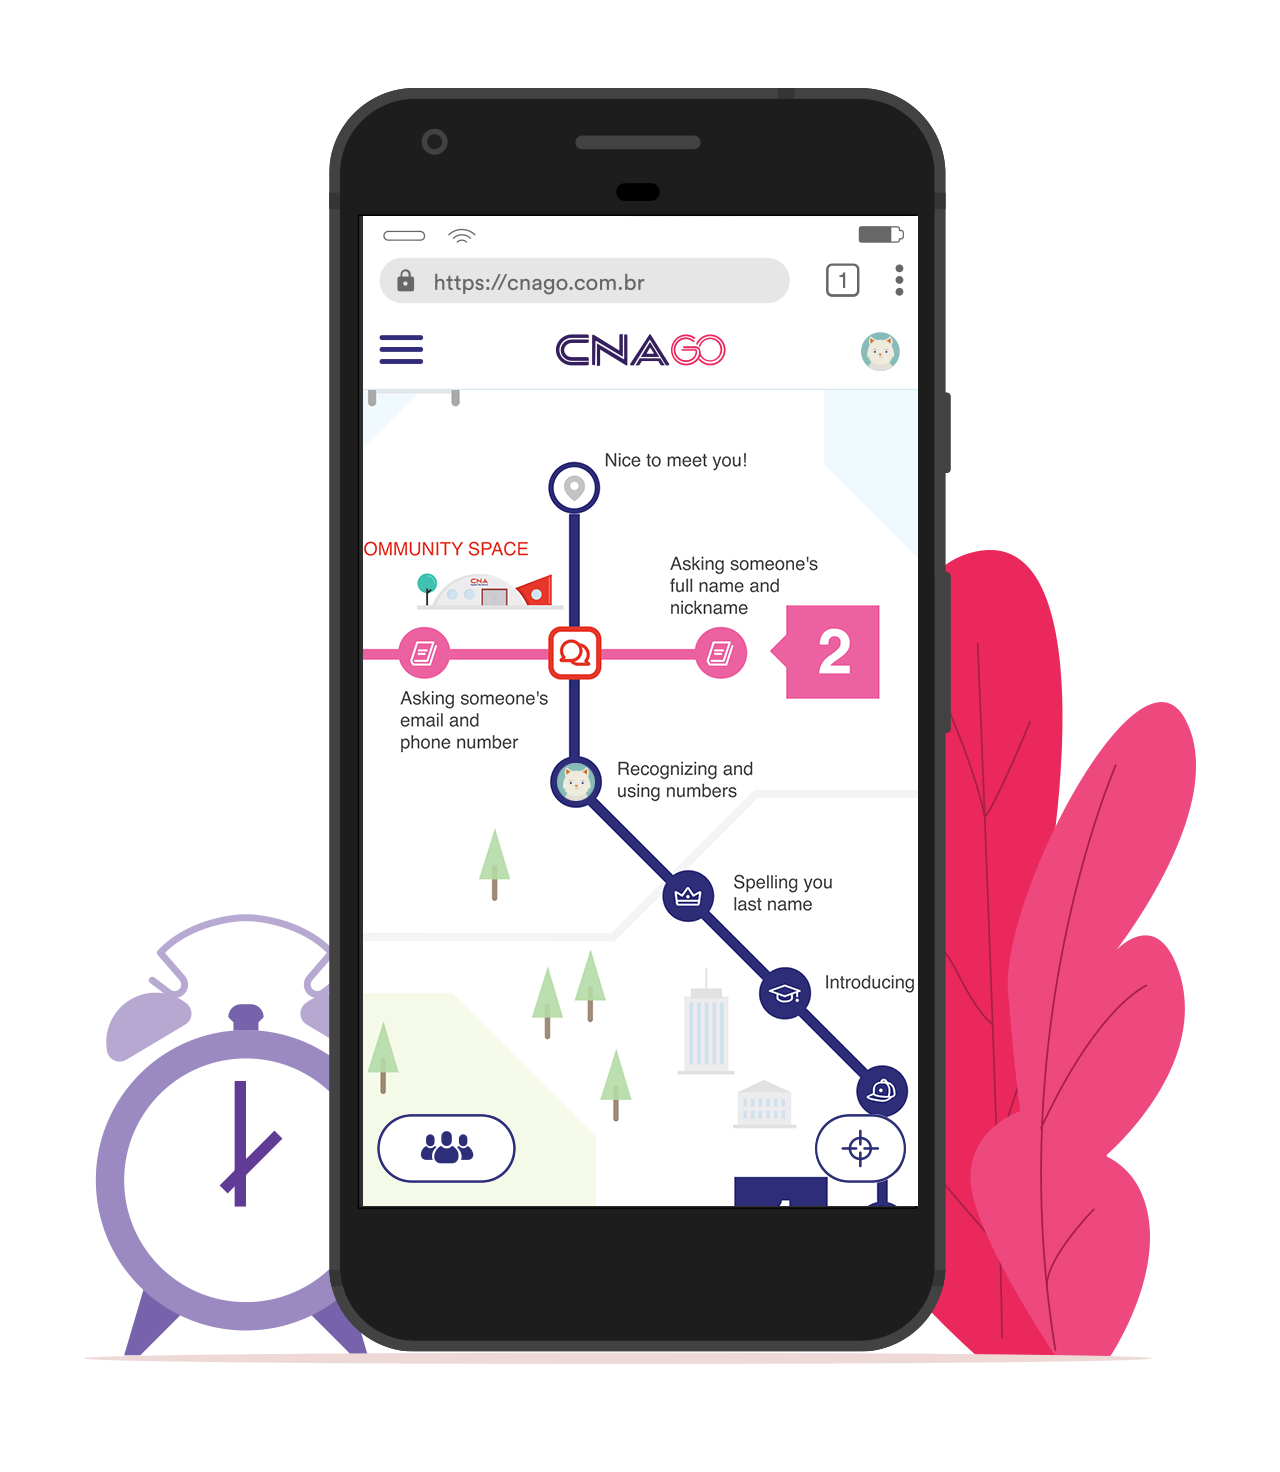 cna-go-map